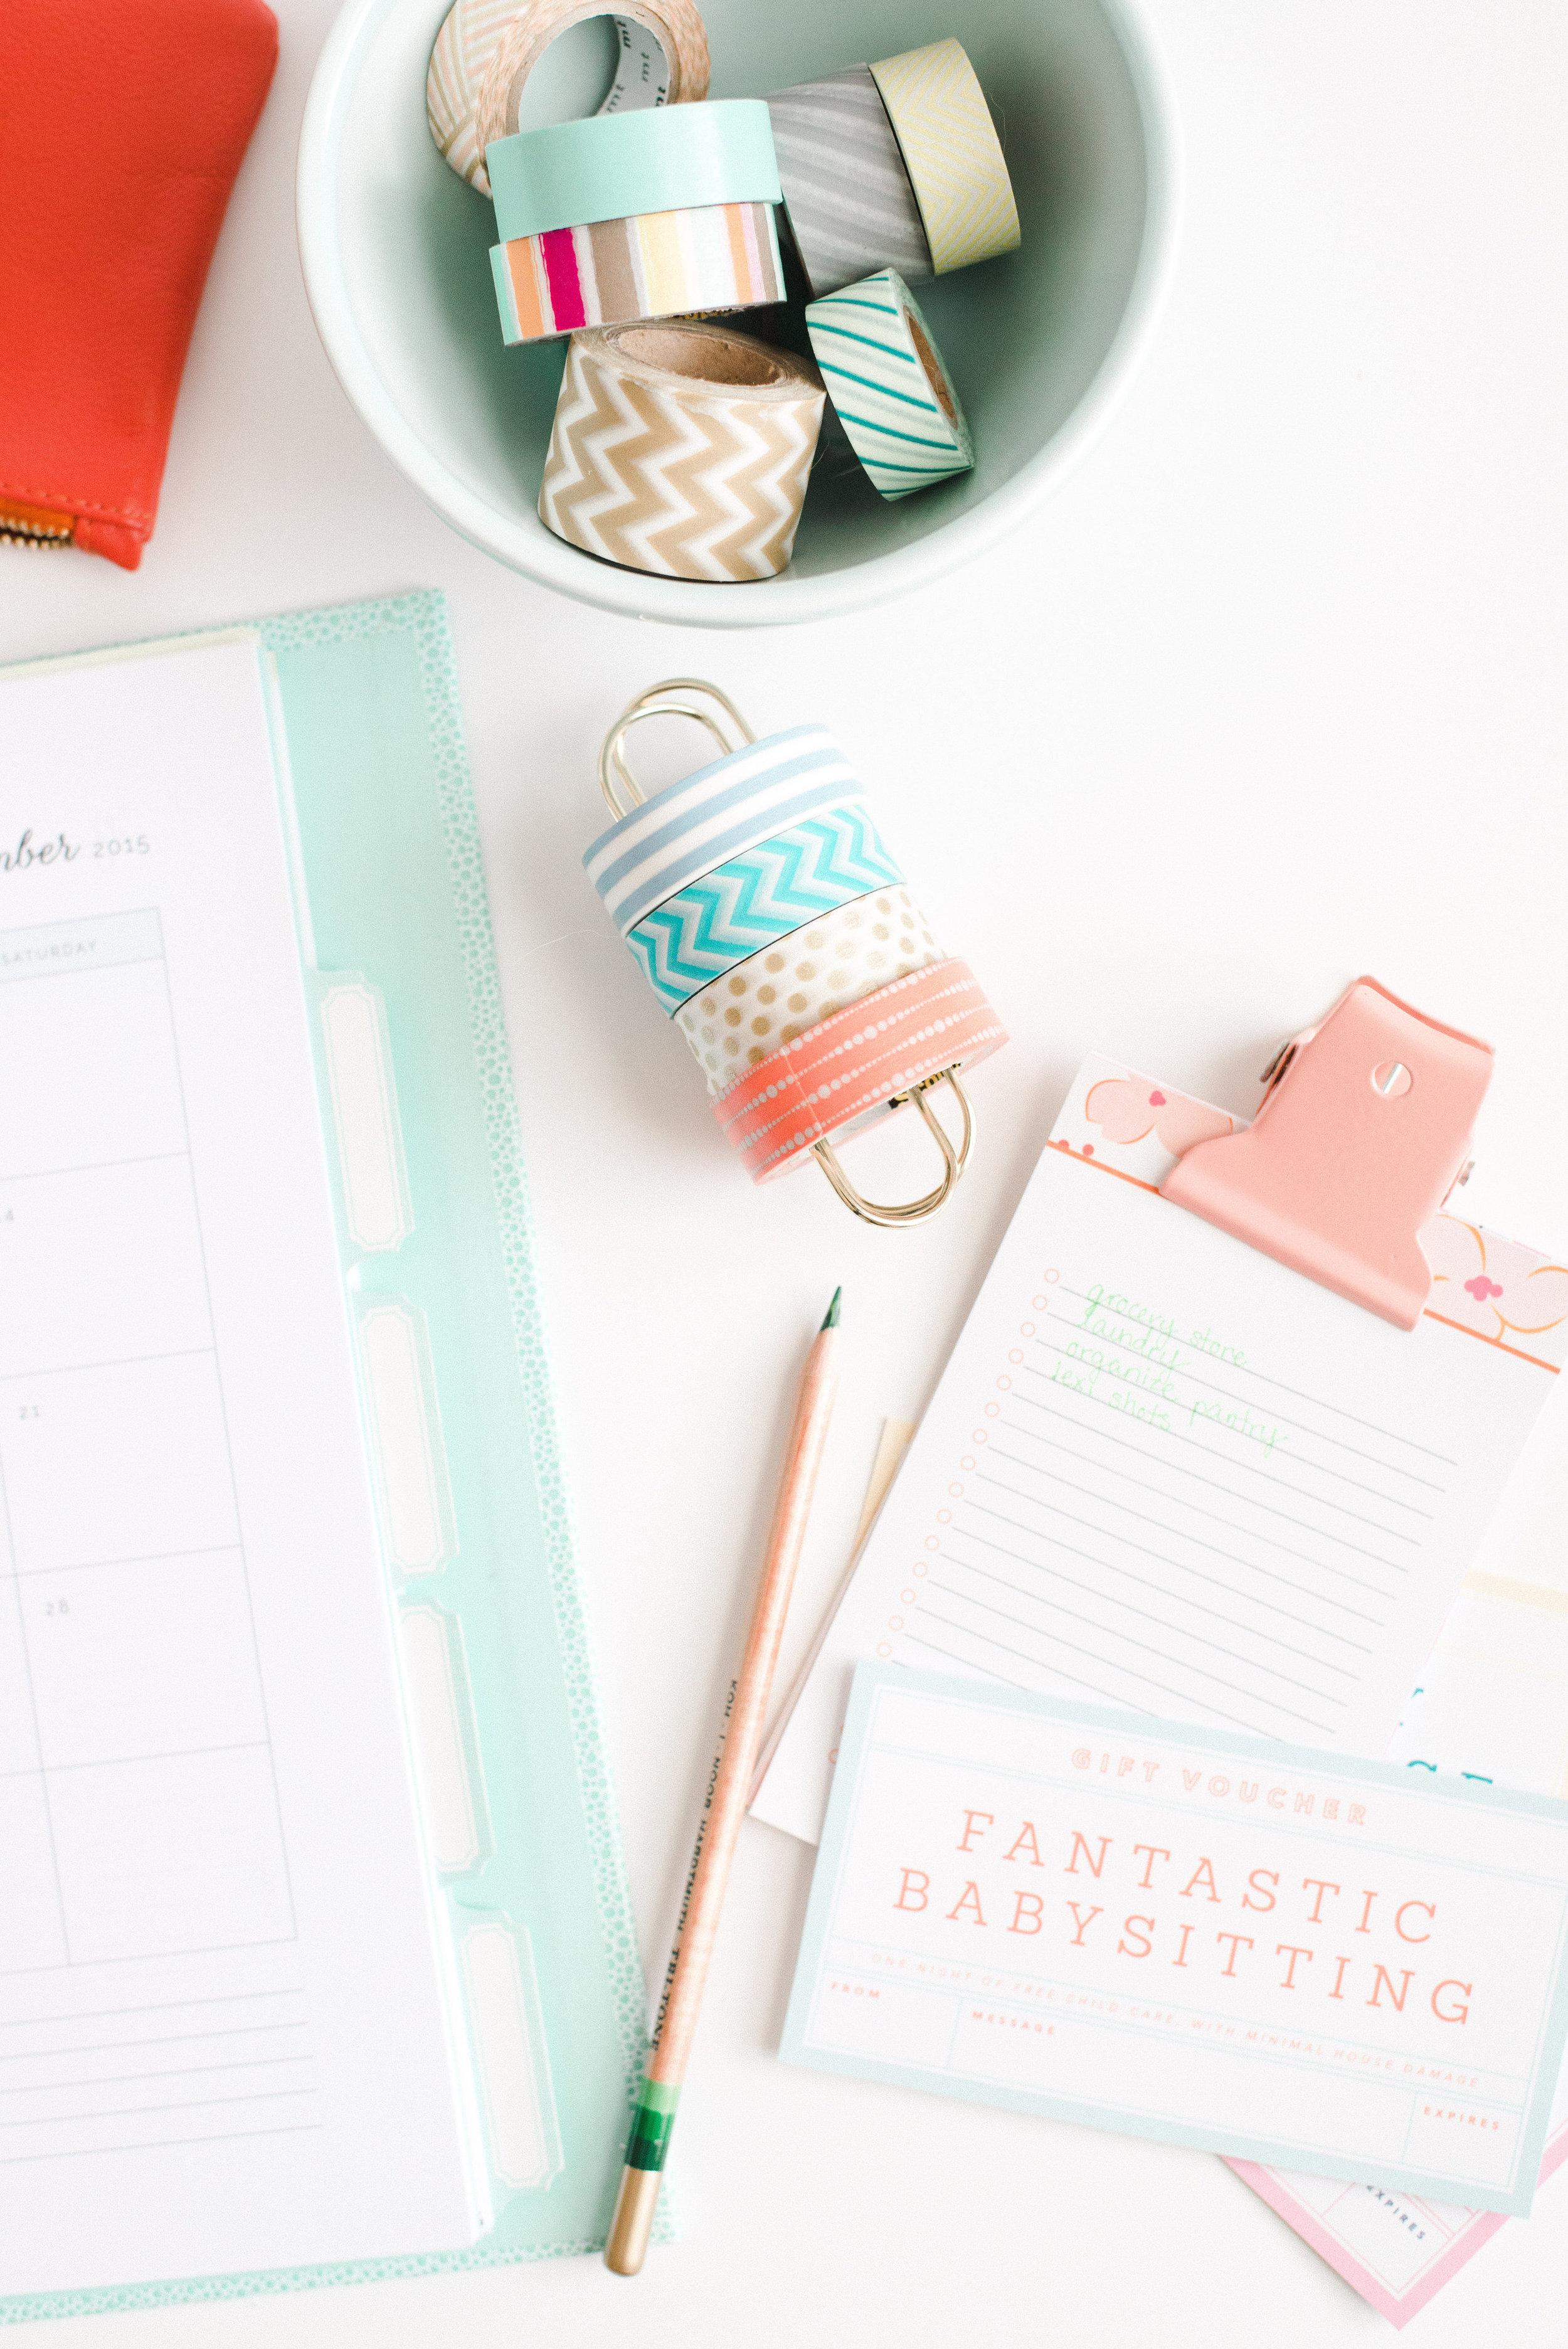 The Daybook Planner-Elle Co 2015-0012 (2).jpg